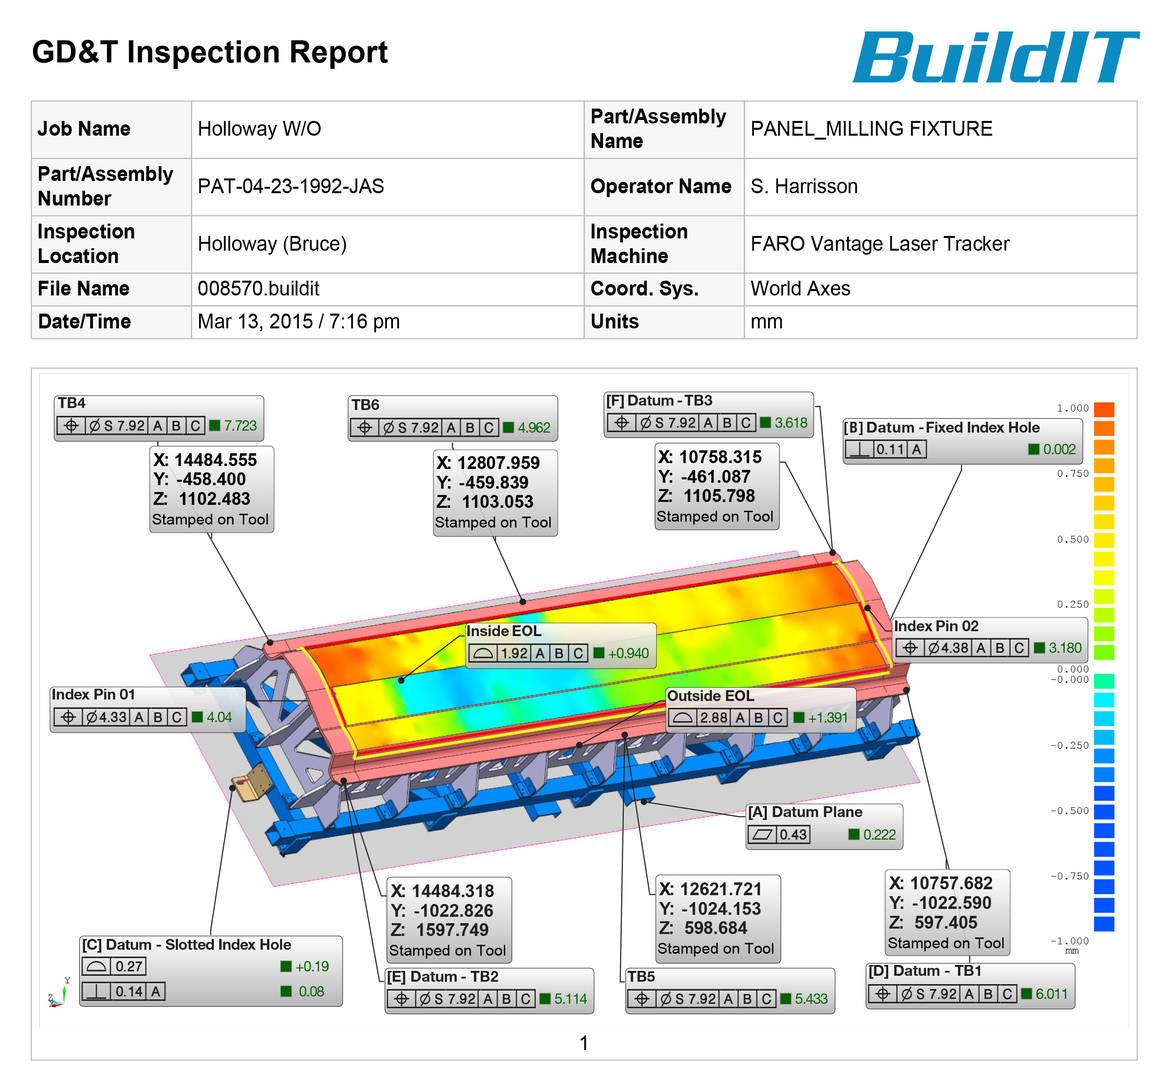 FARO Vantage Laser Trackers & BuildIT Metrology Software